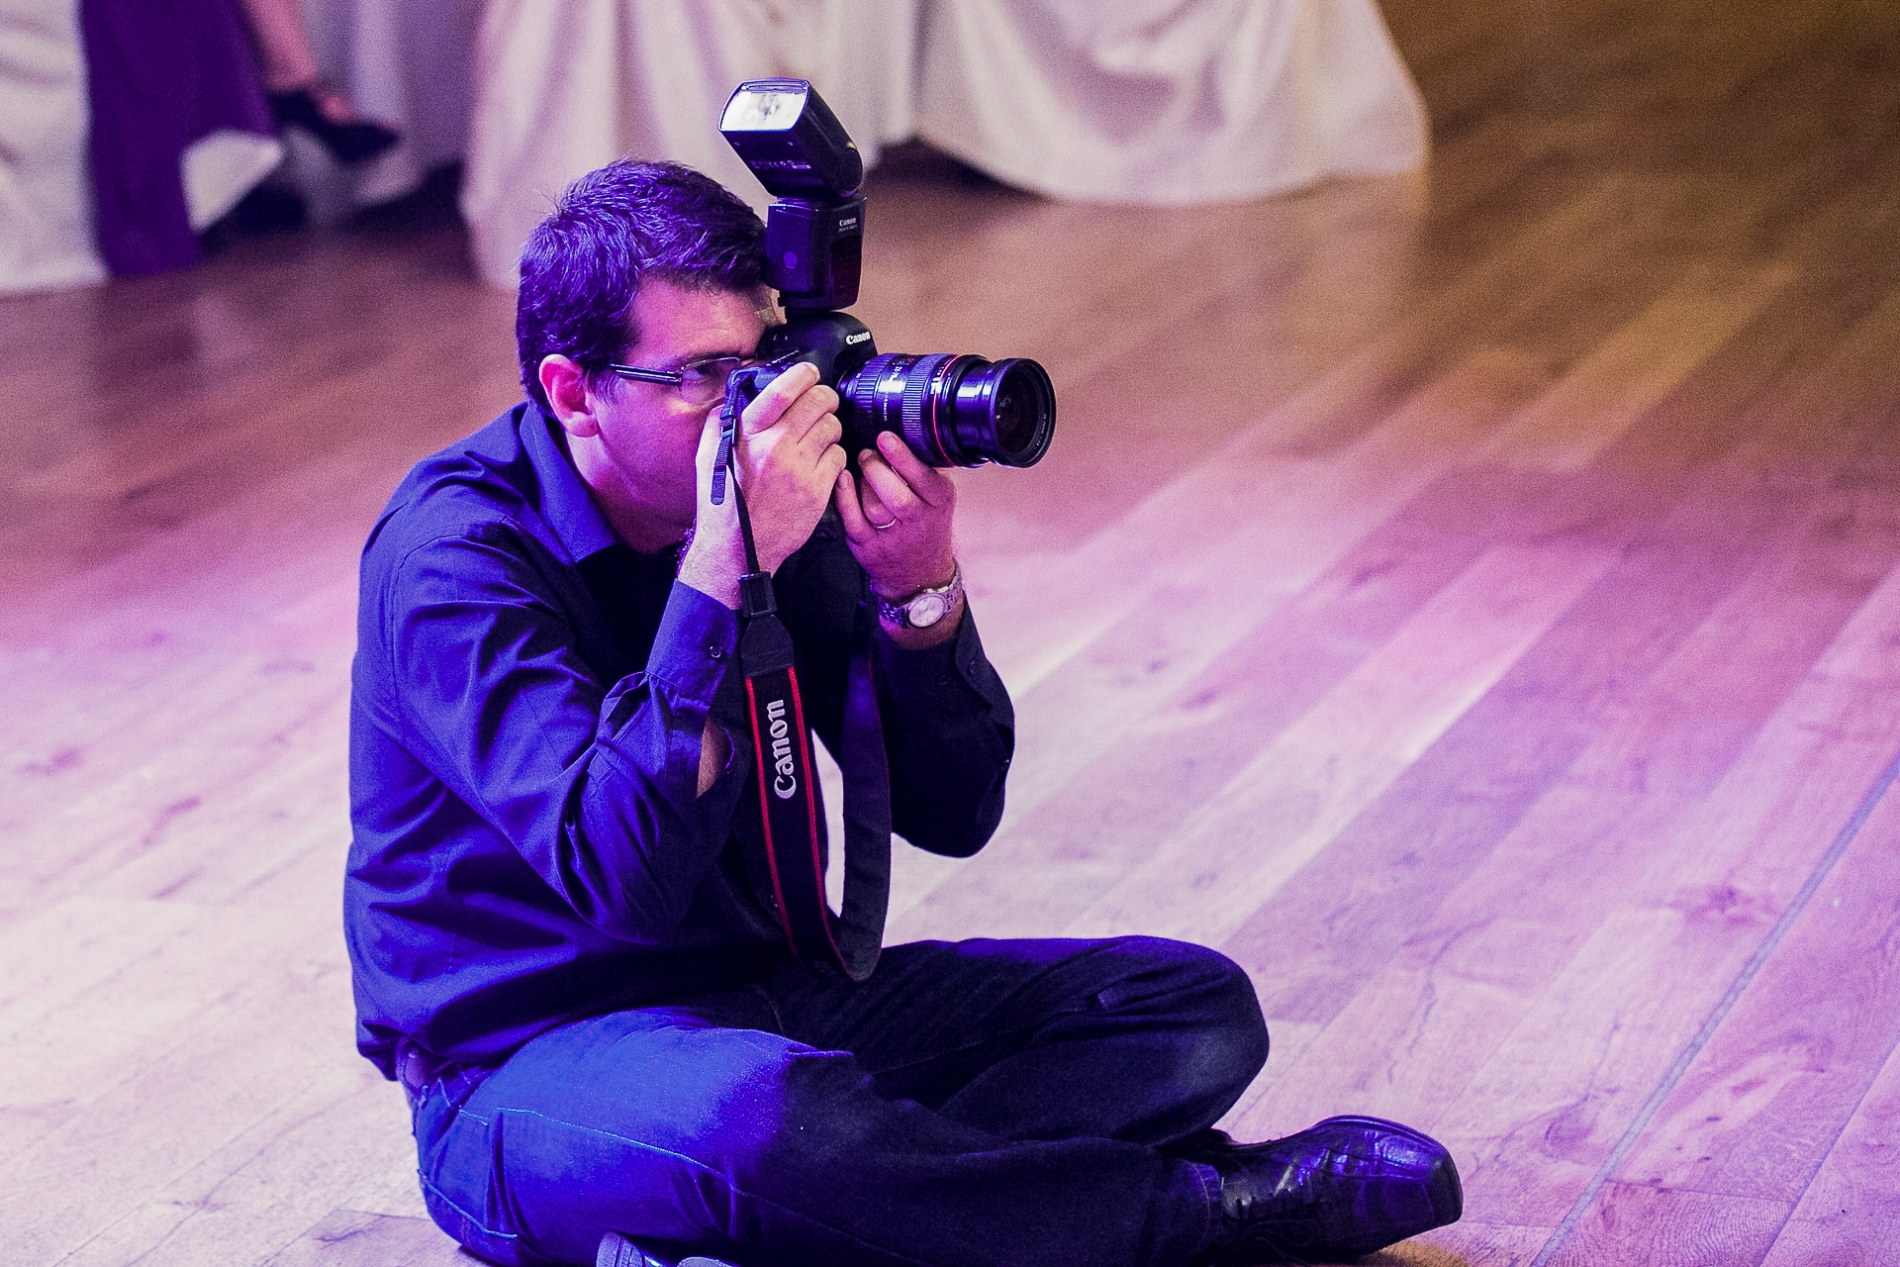 El fotógrafo de bodas de Bucarest, Mihai Zaharia, de Rumania.